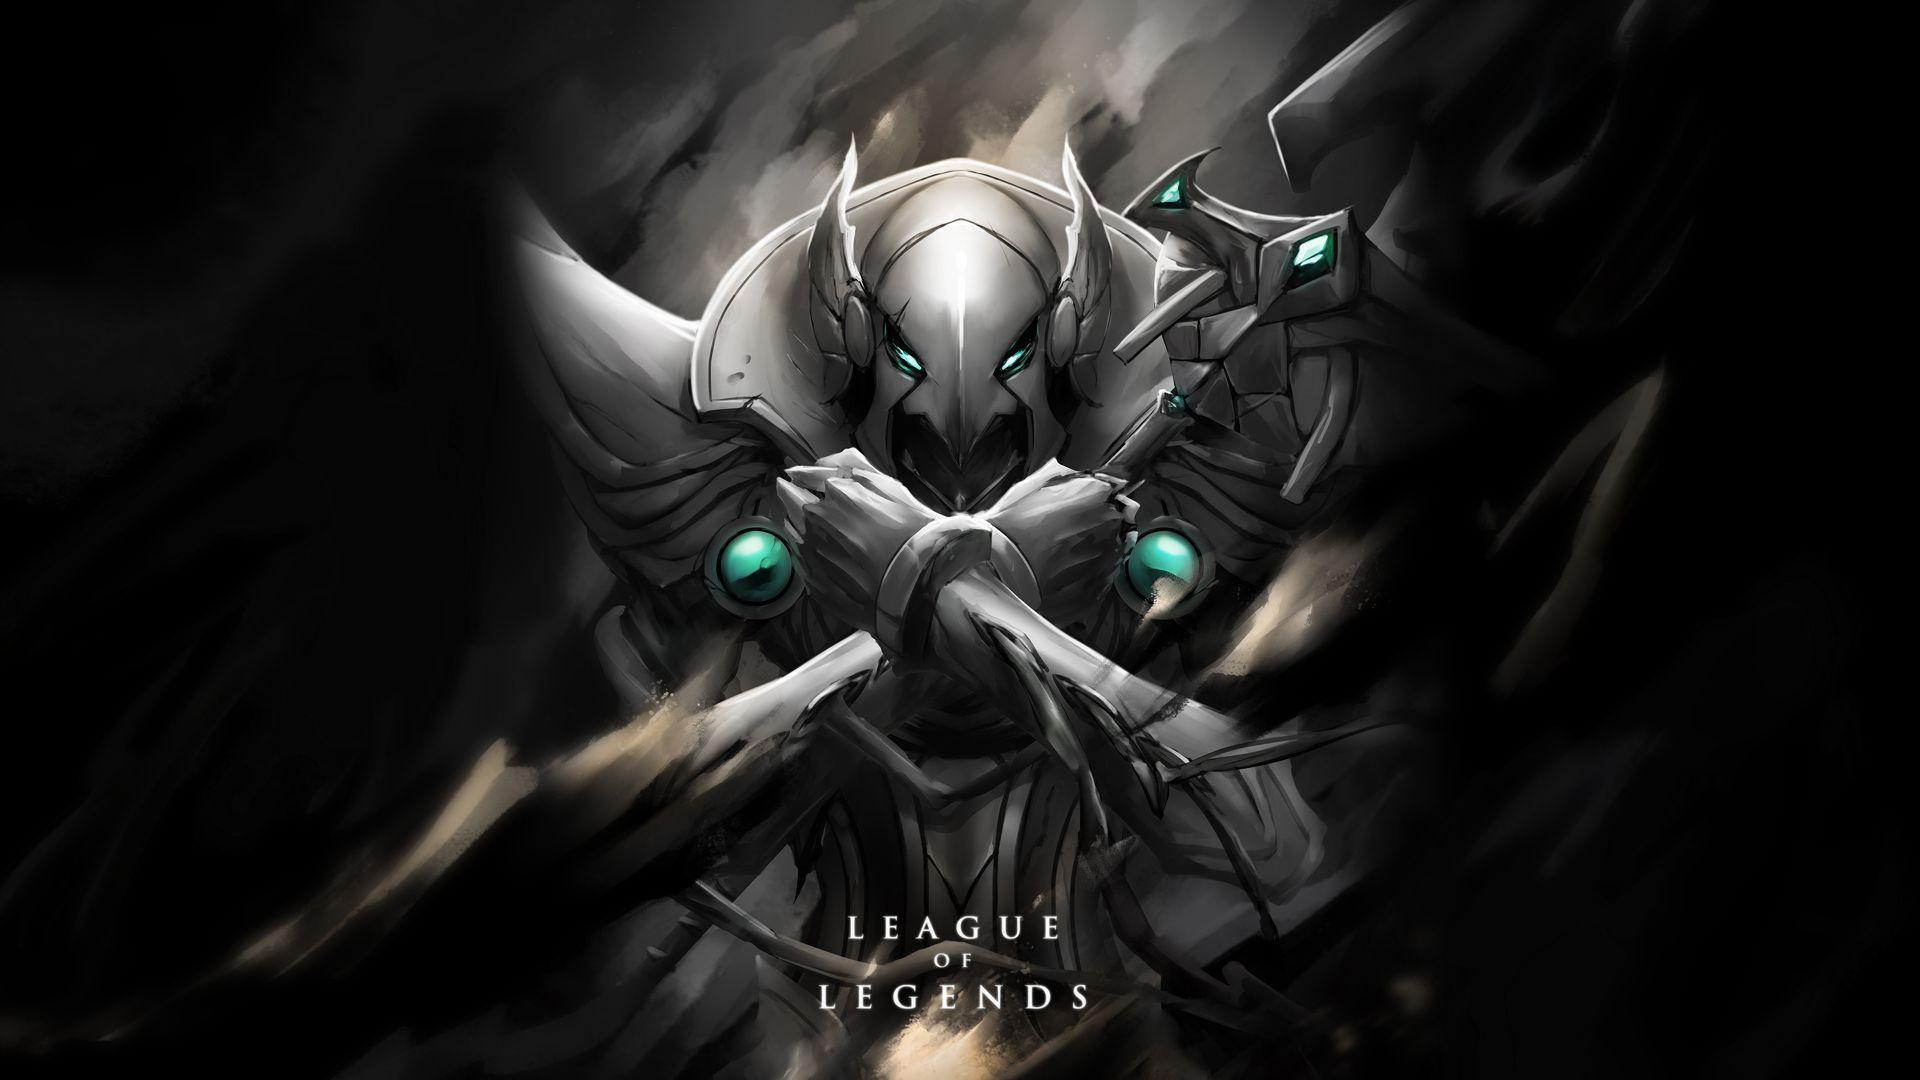 Azir League Of Legends Wallpapers HD 1920x1080 League Of